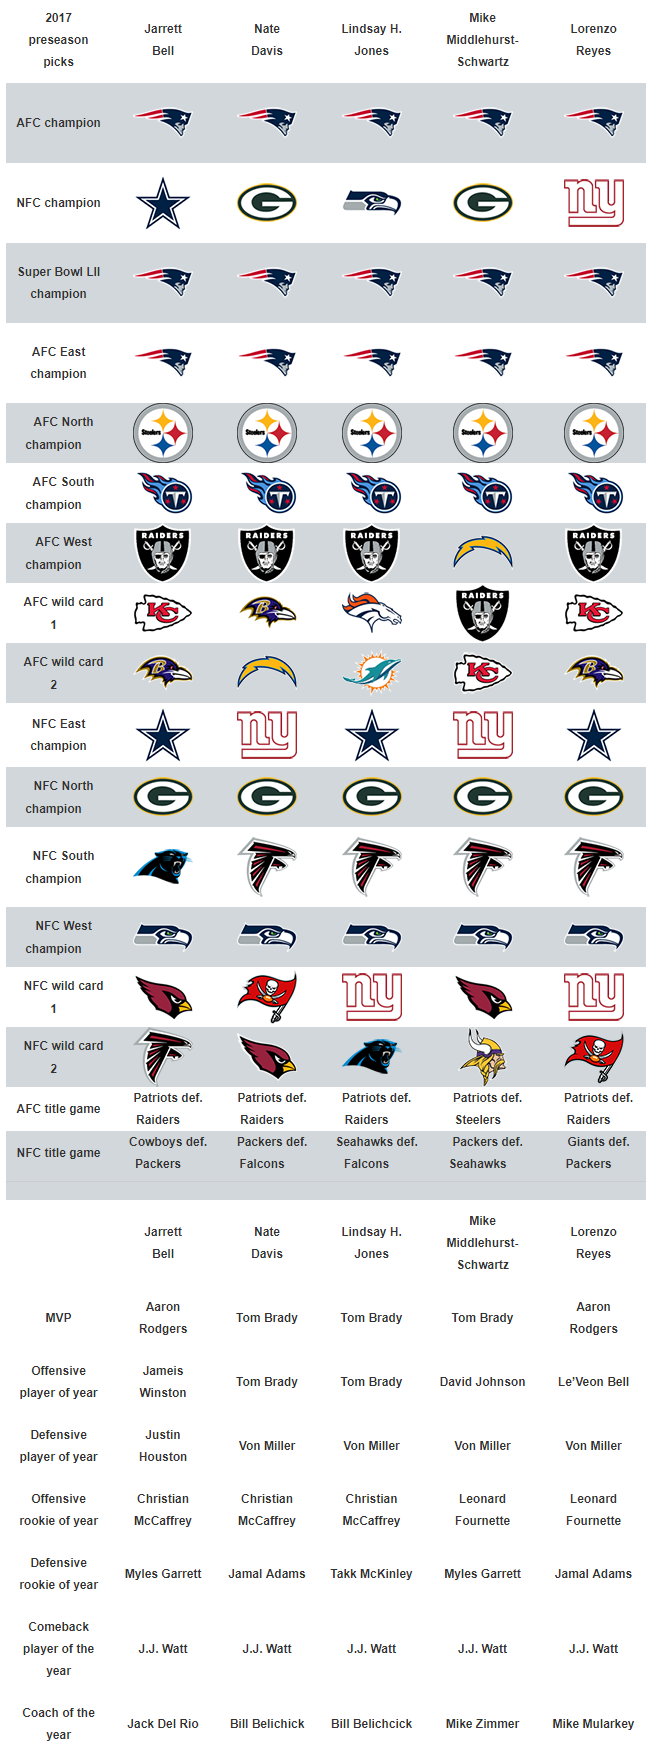 USA TODAY Sports' 2017 NFL predictions: Patriots will win Super Bowl